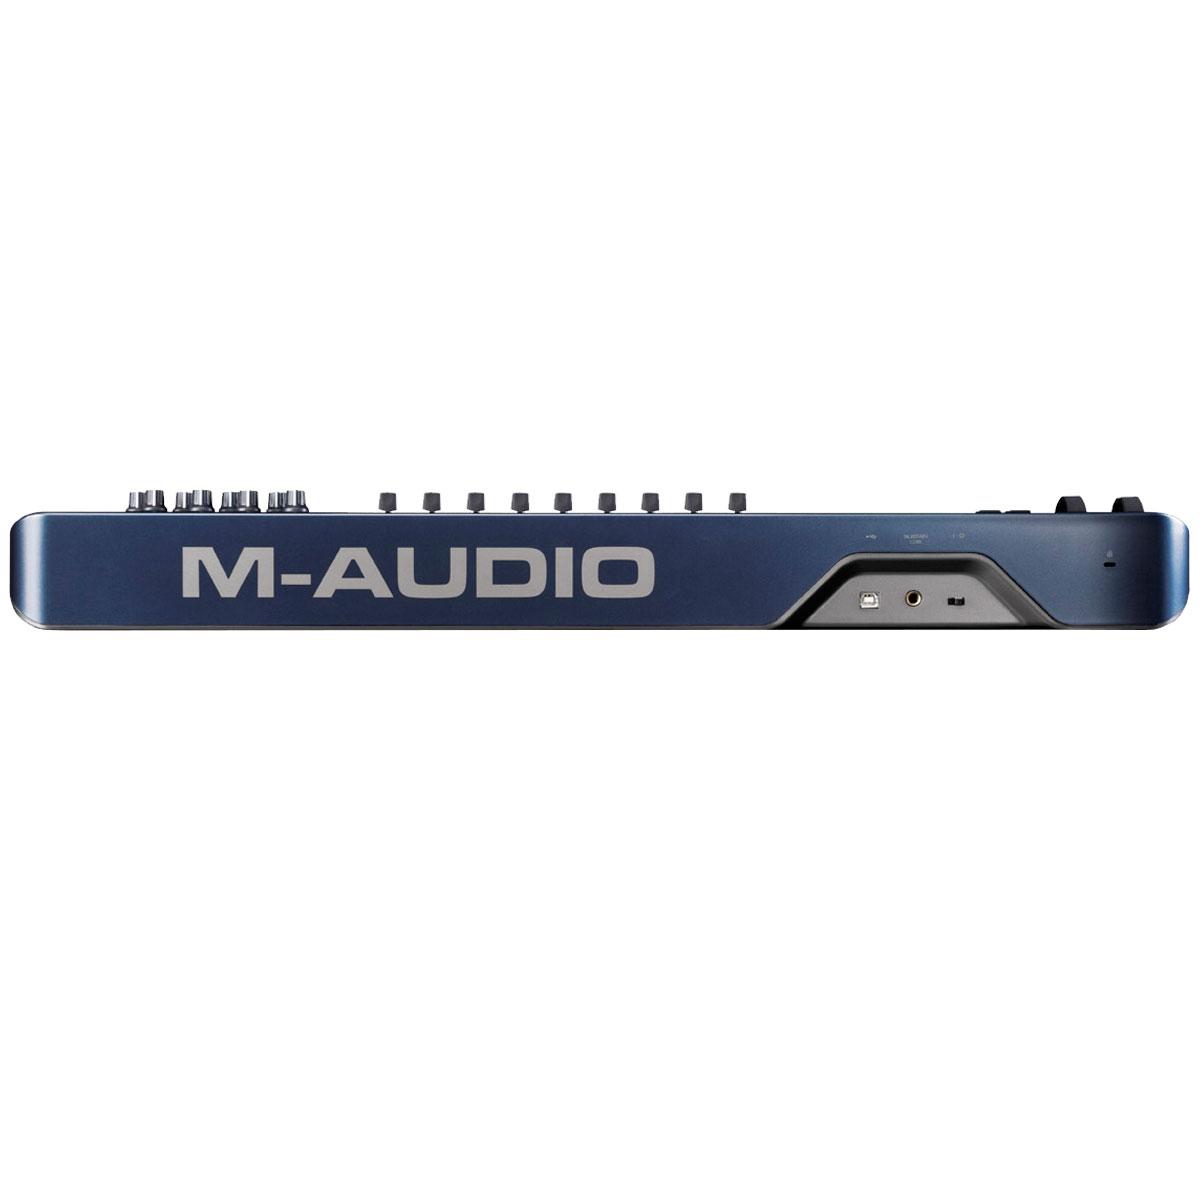 Teclado Controlador MIDI 49 Teclas c/ USB - Oxygen 49 M-Audio